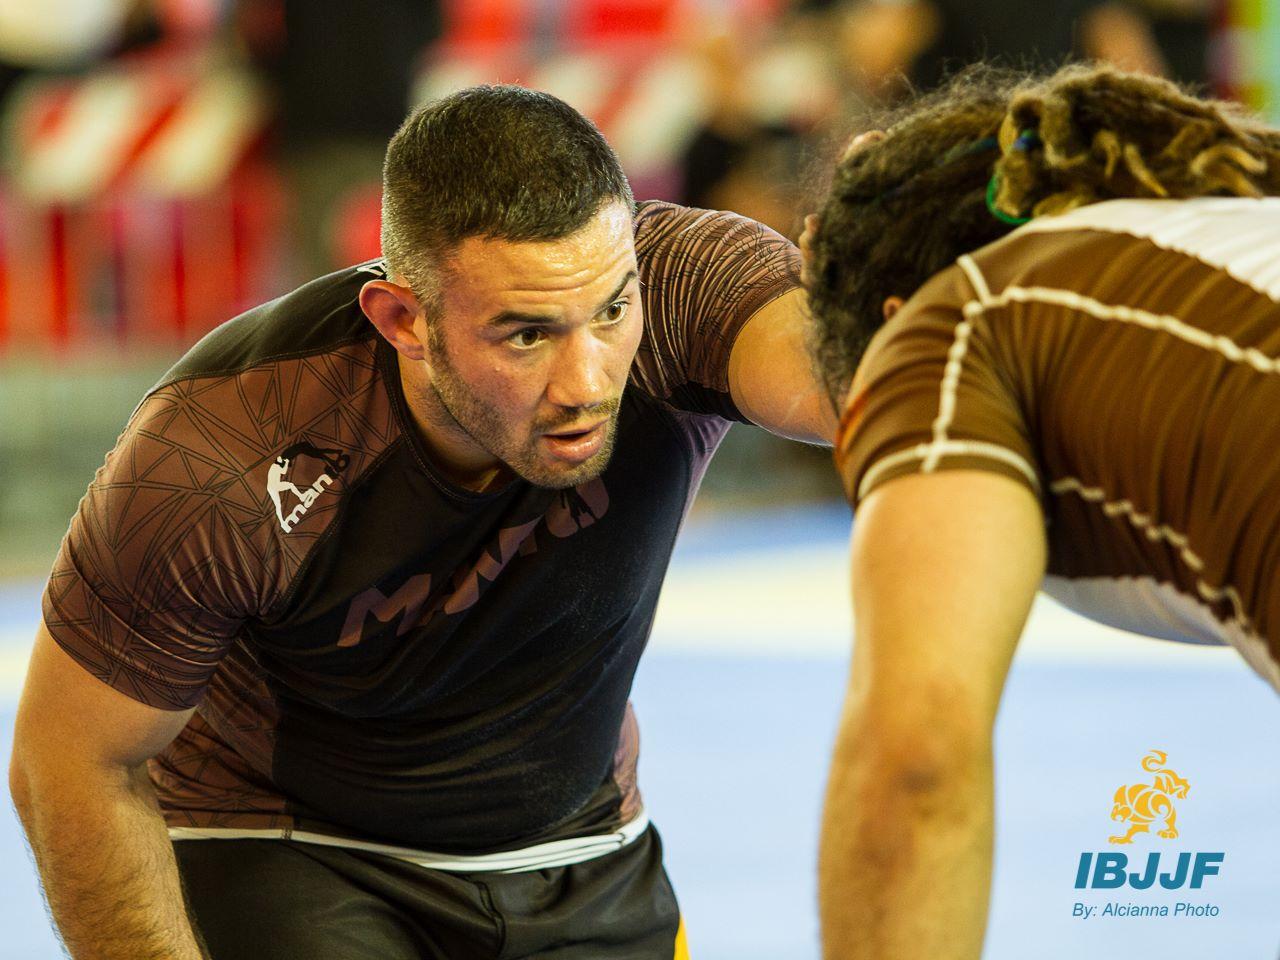 Bruno at the 2014 European No-Gi Championship. Photo: Alcianna Photo